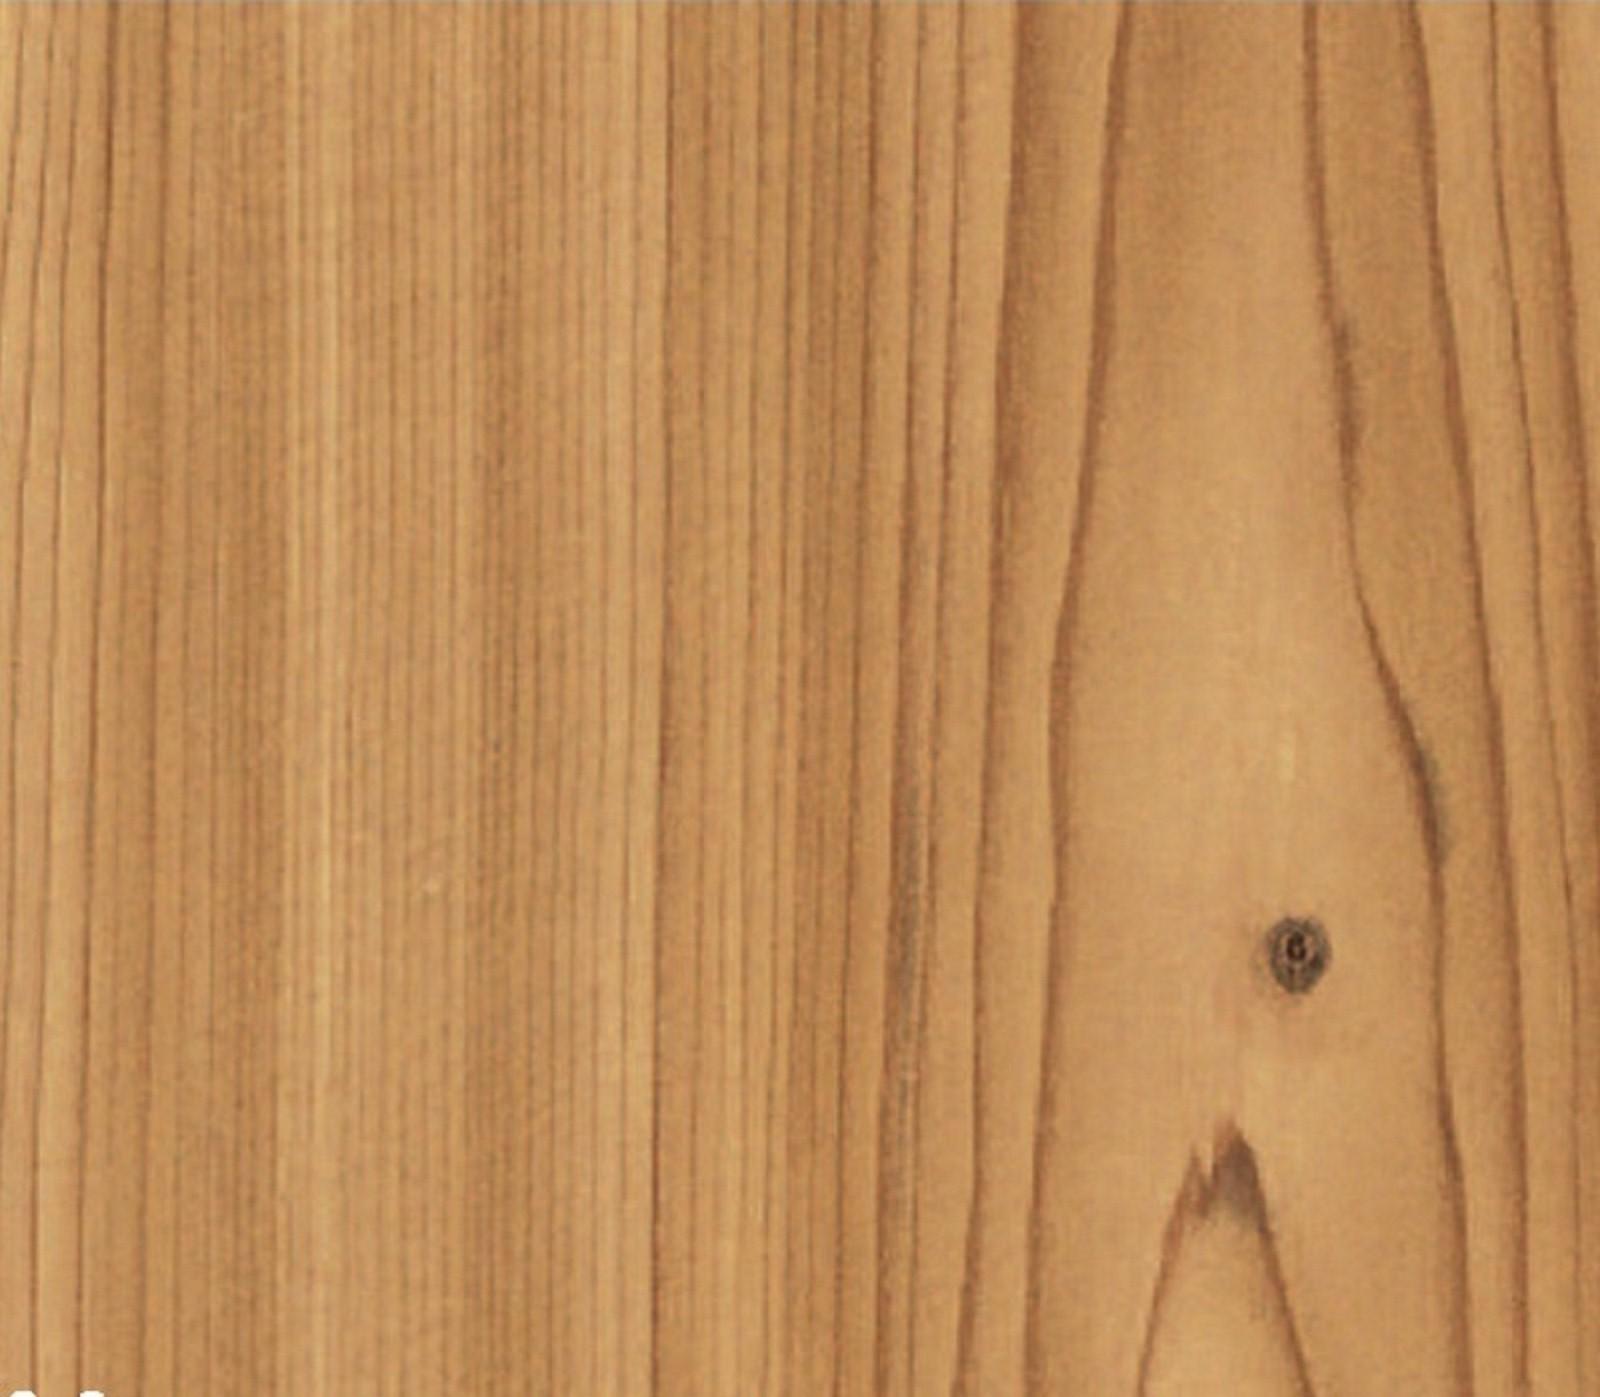 klebefolie holzoptik fichte m belfolie holz dekorfolie 90 x 200 cm klebefolie holzoptik. Black Bedroom Furniture Sets. Home Design Ideas